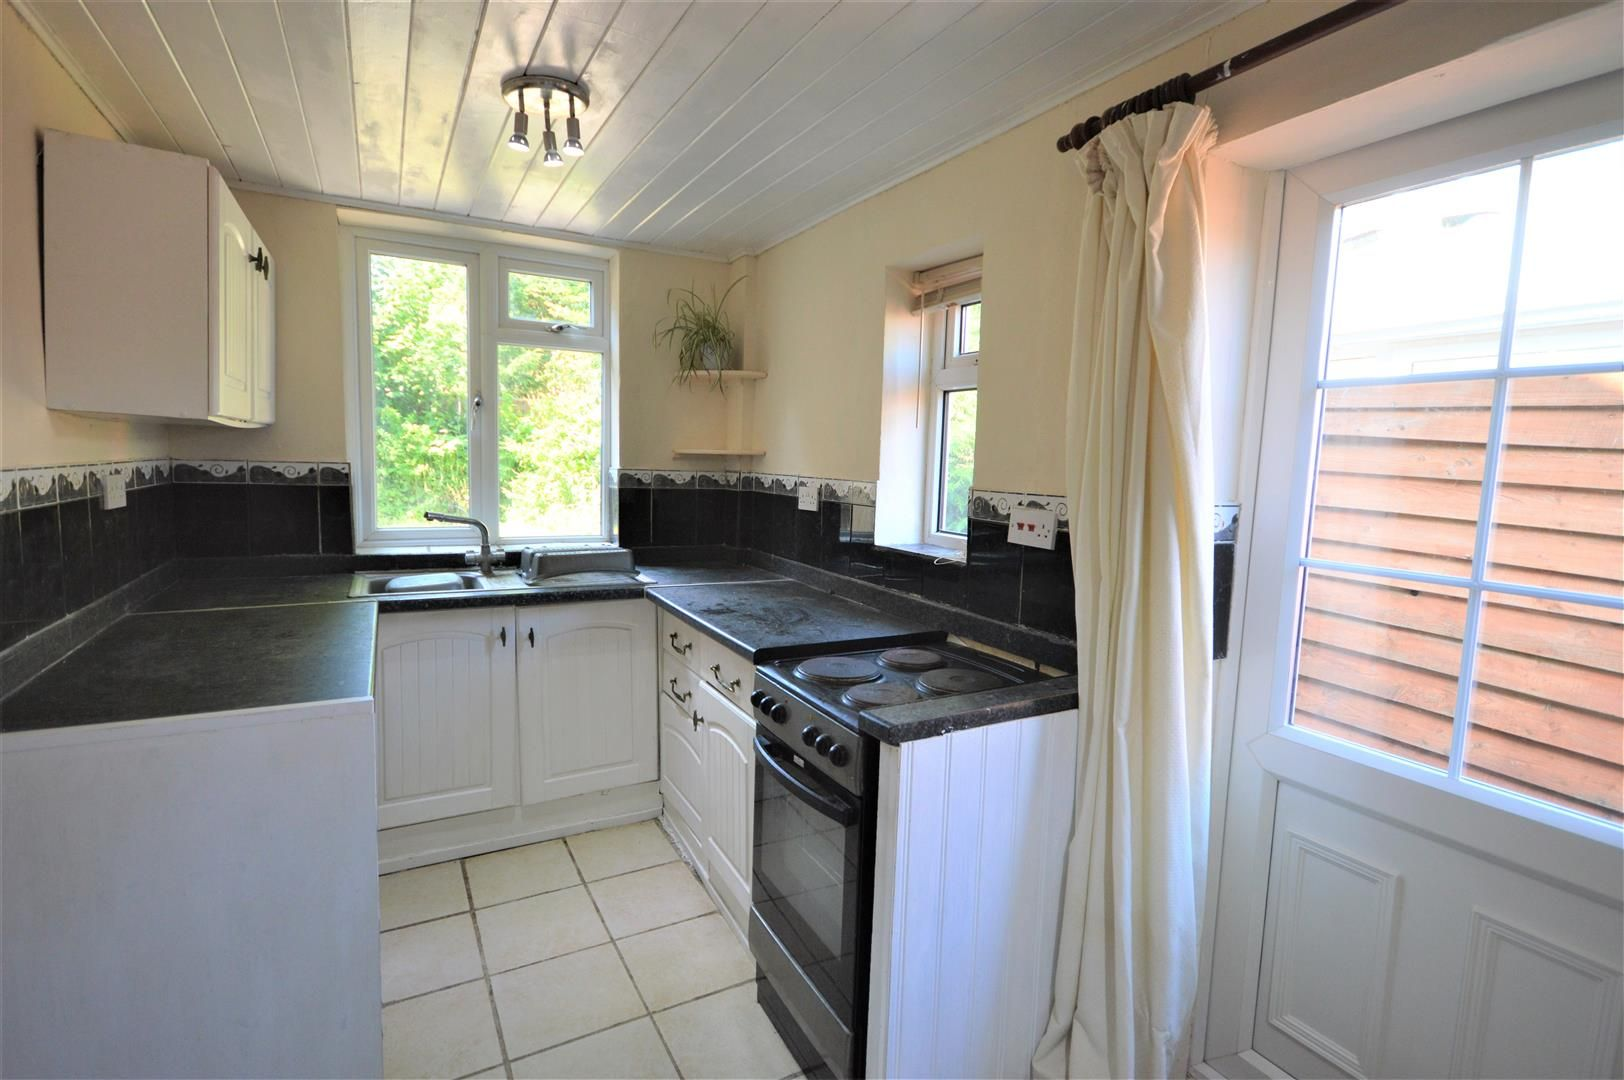 4 bed semi-detached for sale in Presteigne  - Property Image 7